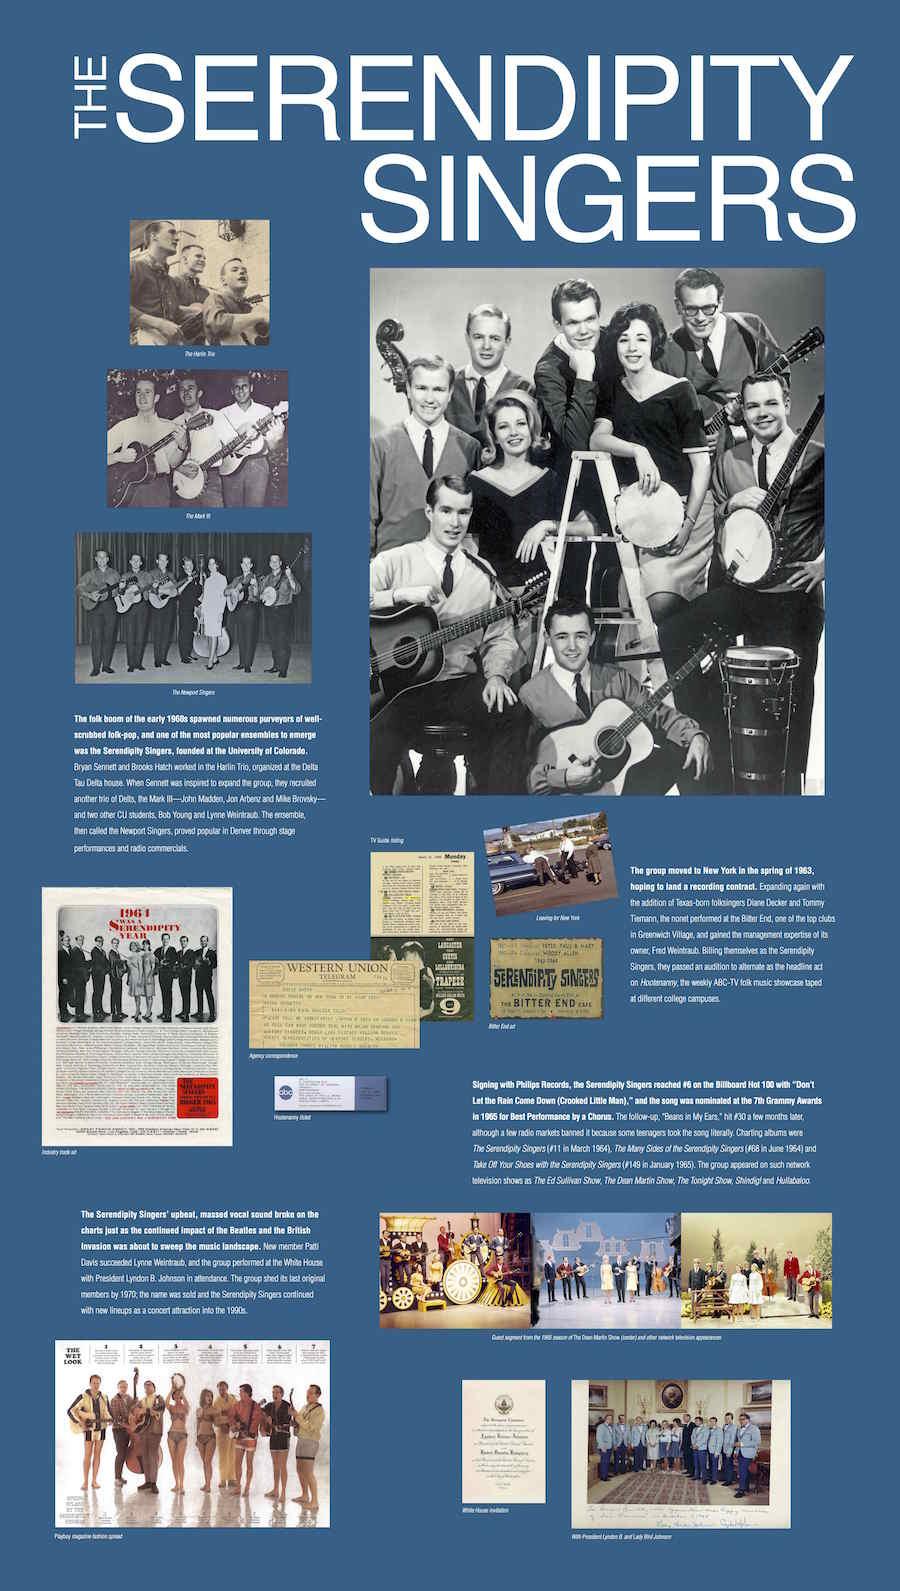 SERENDIPITY SINGERS exhibit panel